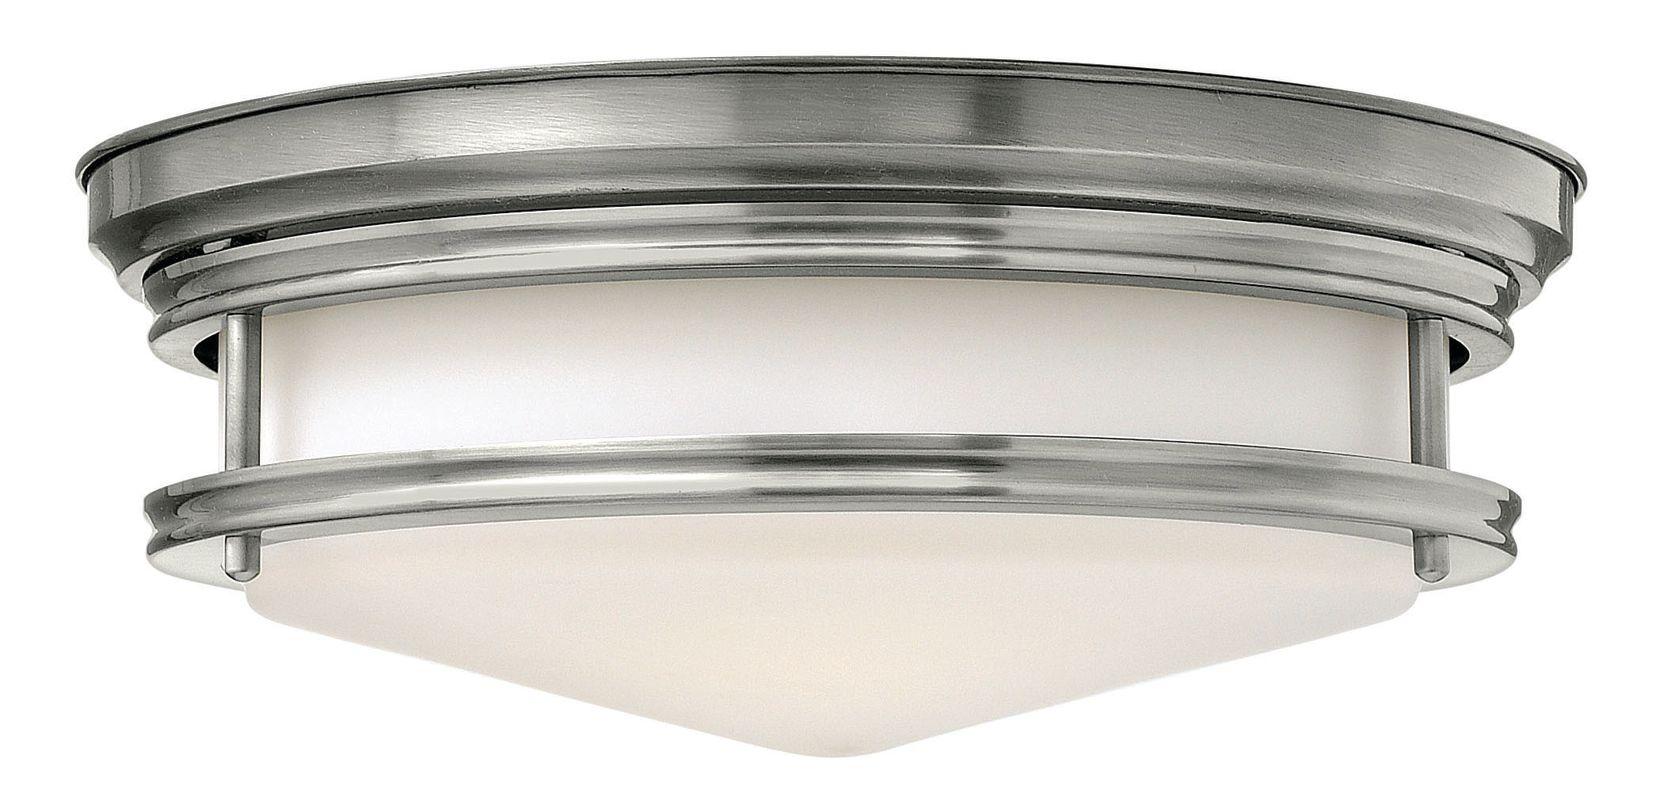 Hinkley Lighting 3301-GU24 3 Light Title 24 Fluorescent Flush Mount Sale $269.00 ITEM#: 2635249 MODEL# :3301AN-GU24 UPC#: 640665330281 :